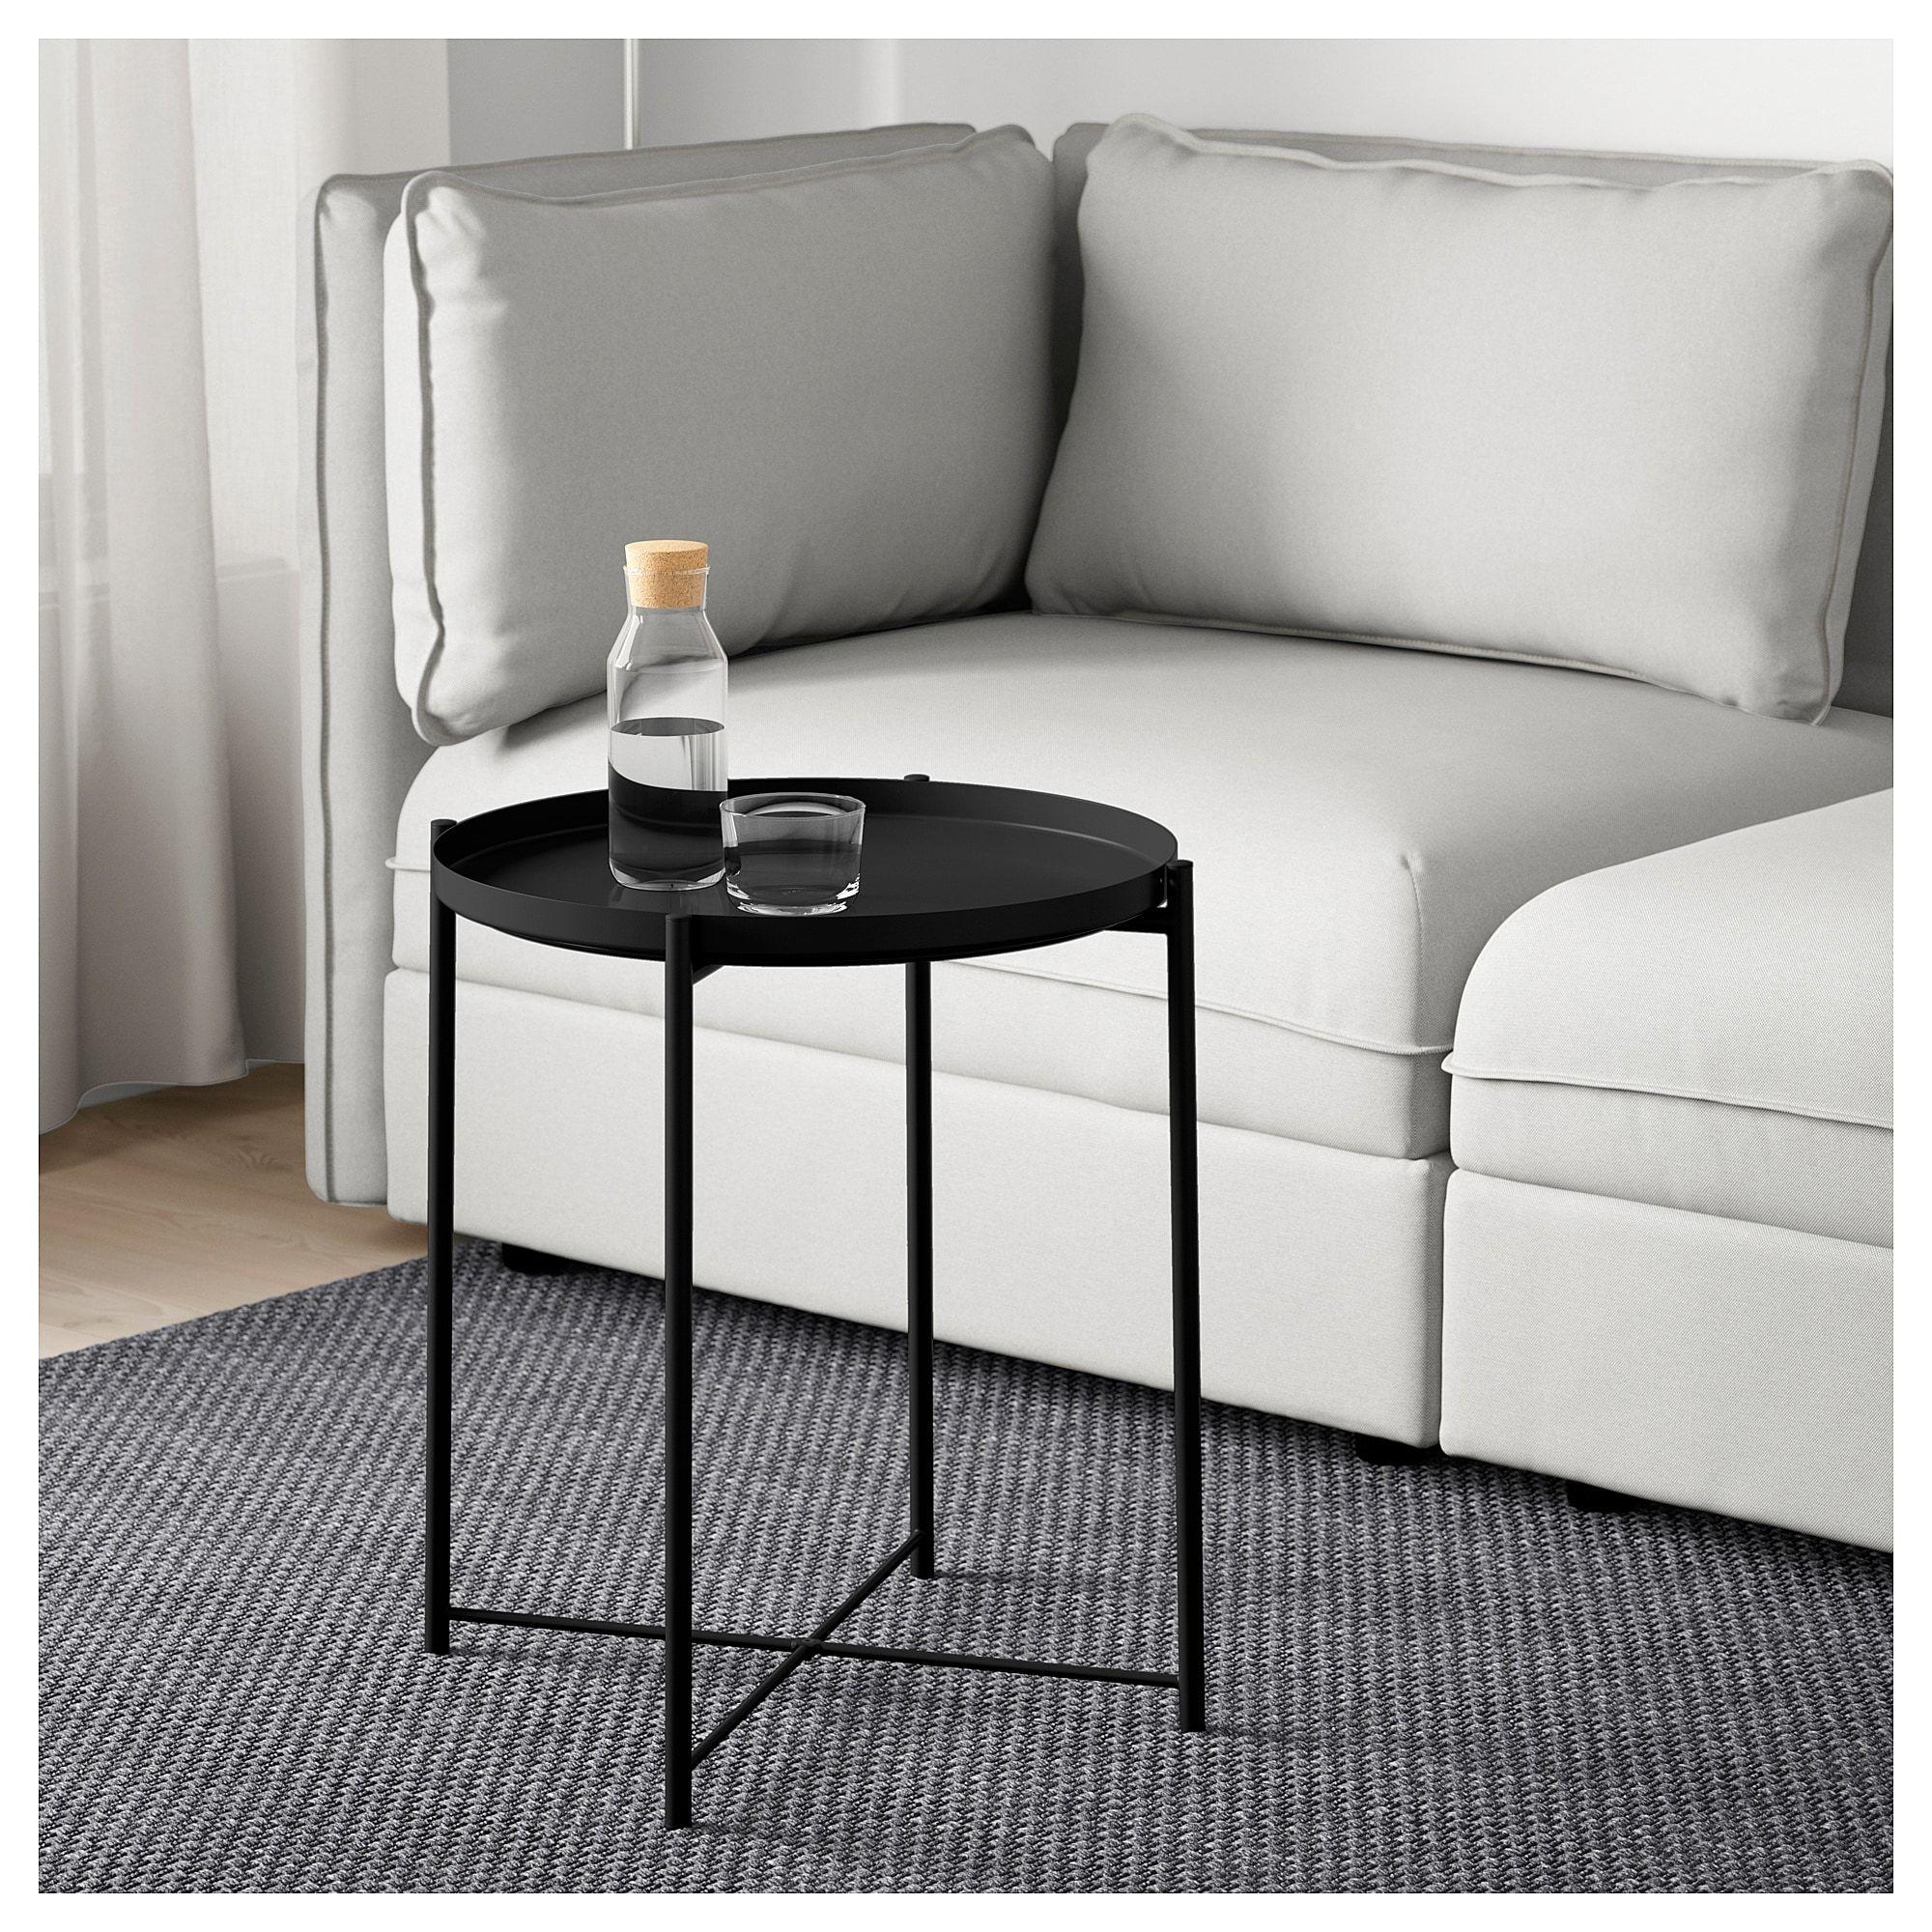 Gladom Tray Table Black 17 1 2x20 5 8 Ikea Tray Table Coffee Table Ikea Side Table [ 2000 x 2000 Pixel ]